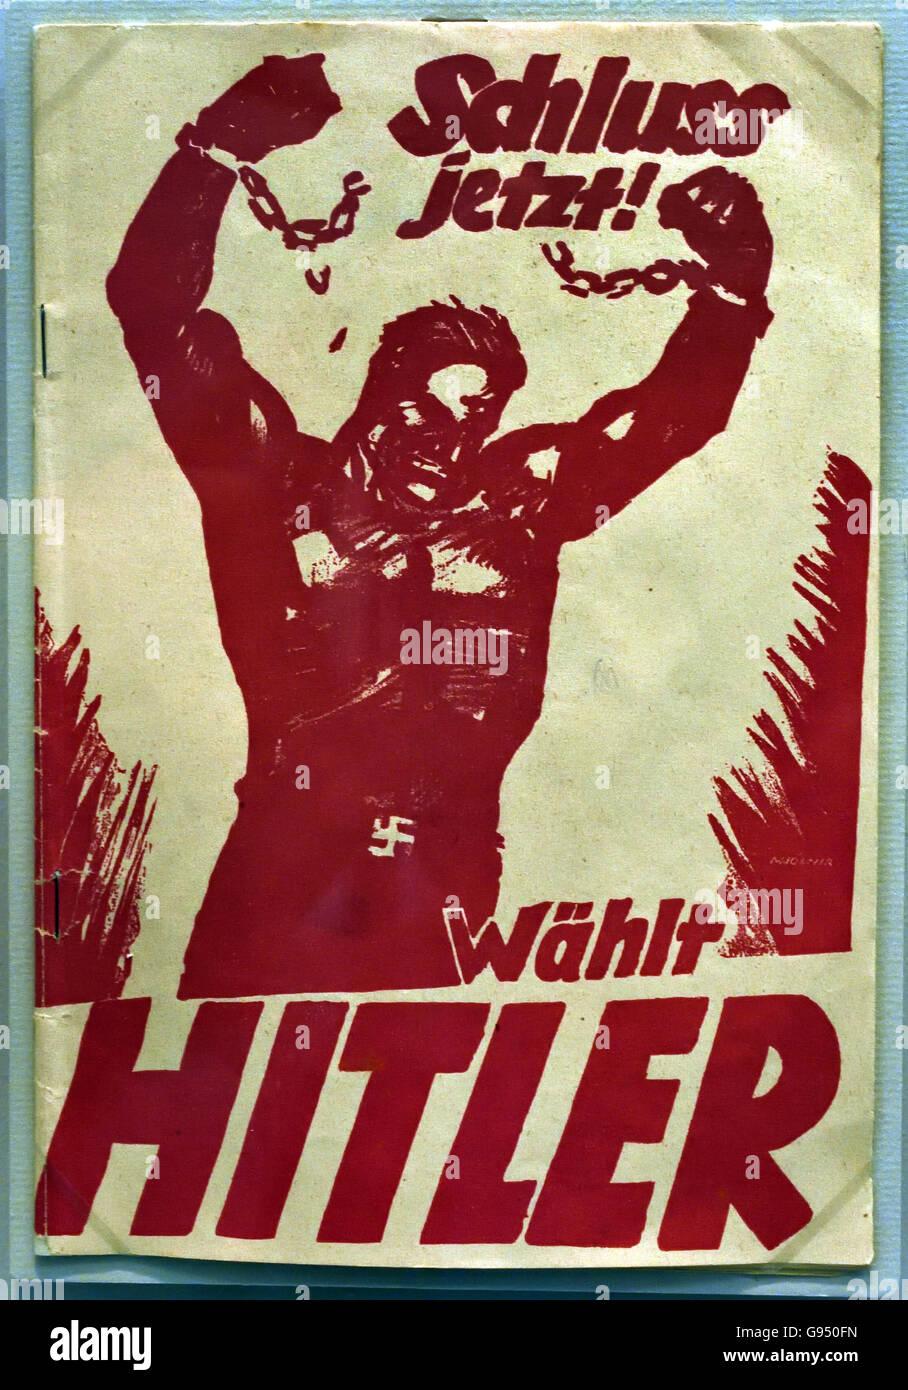 Schluss Jetzt -Wählt Hitler ( Final Now -Selects Hitler )elections Berlin Nazi Germany Stock Photo